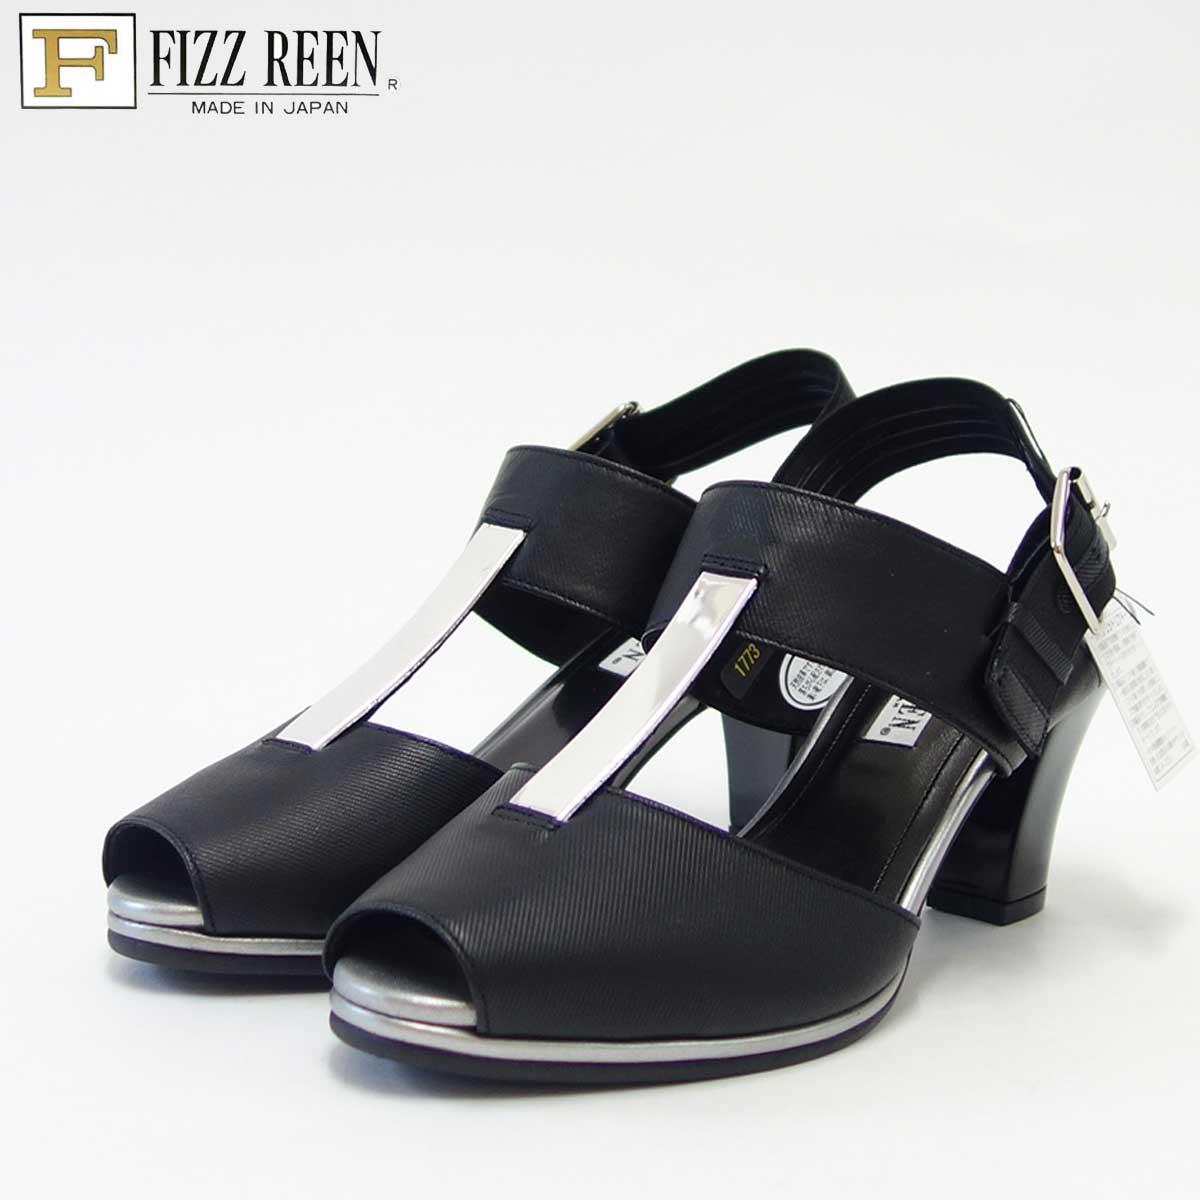 FIZZ REEN フィズリーン 1773 ブラックスタイリッシュなTストラップサンダルEEE幅のコンフォートサンダル「靴」